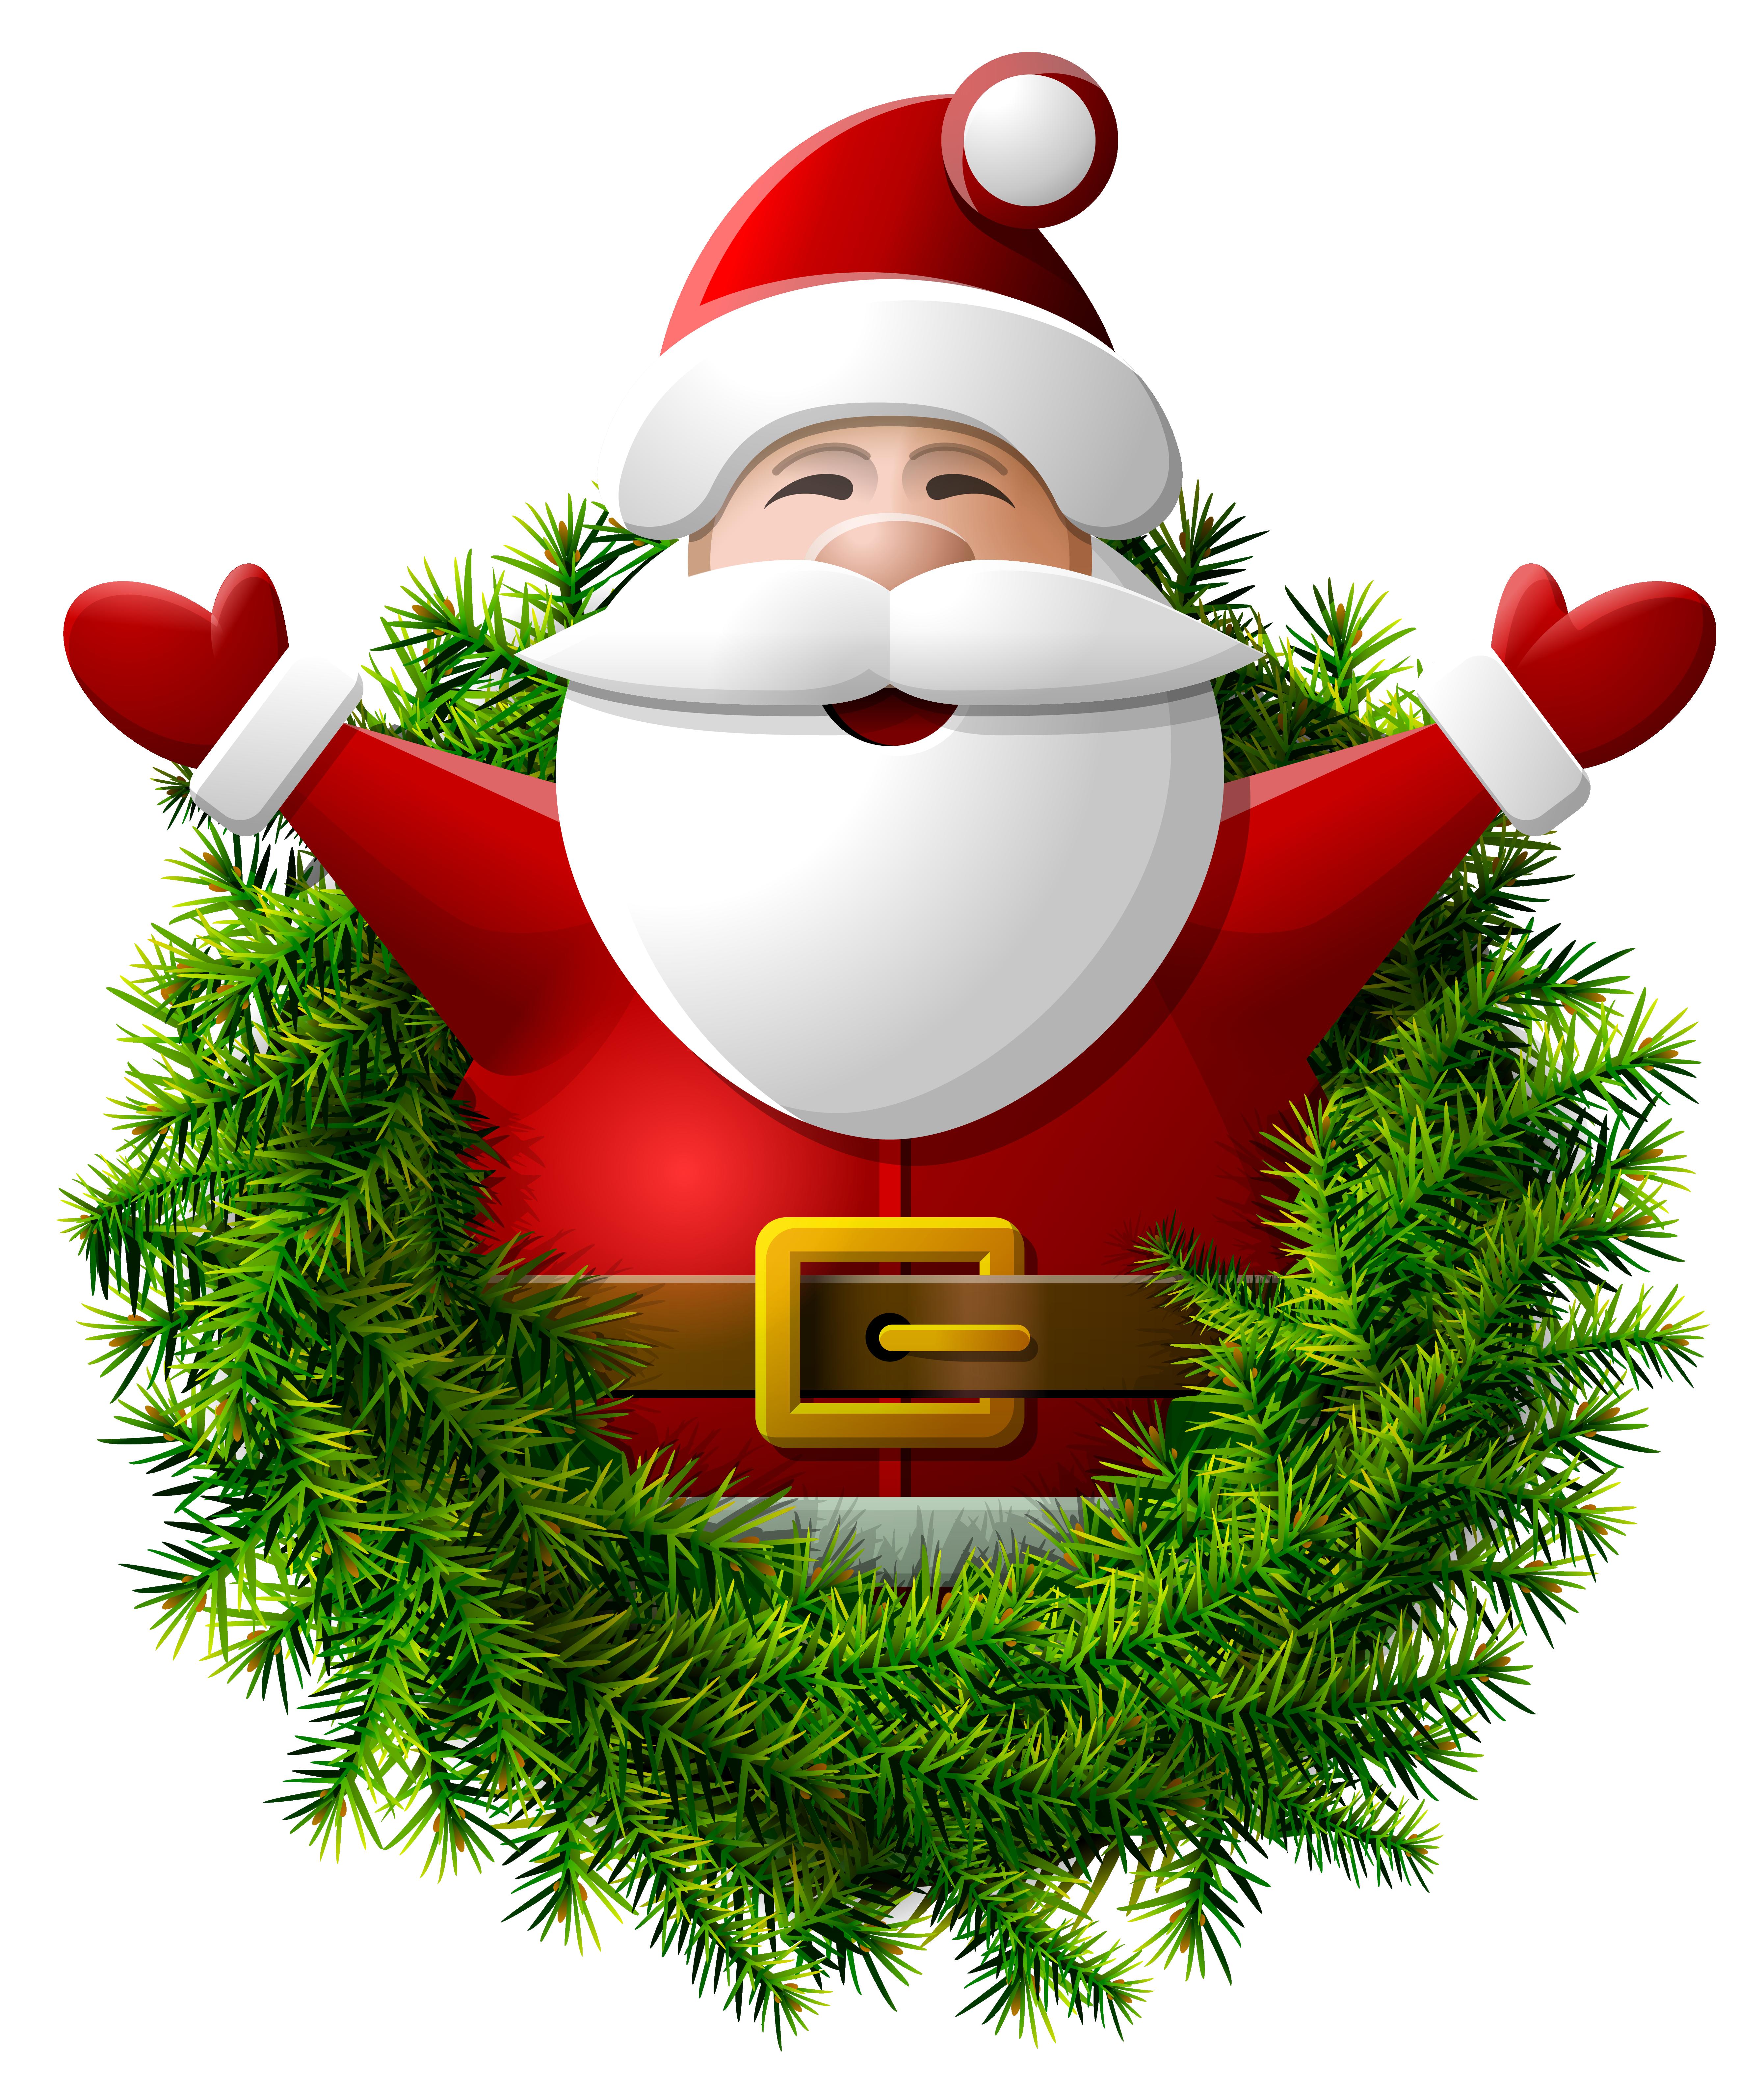 Wreath clipart santa Claus size Yopriceville View Clipart